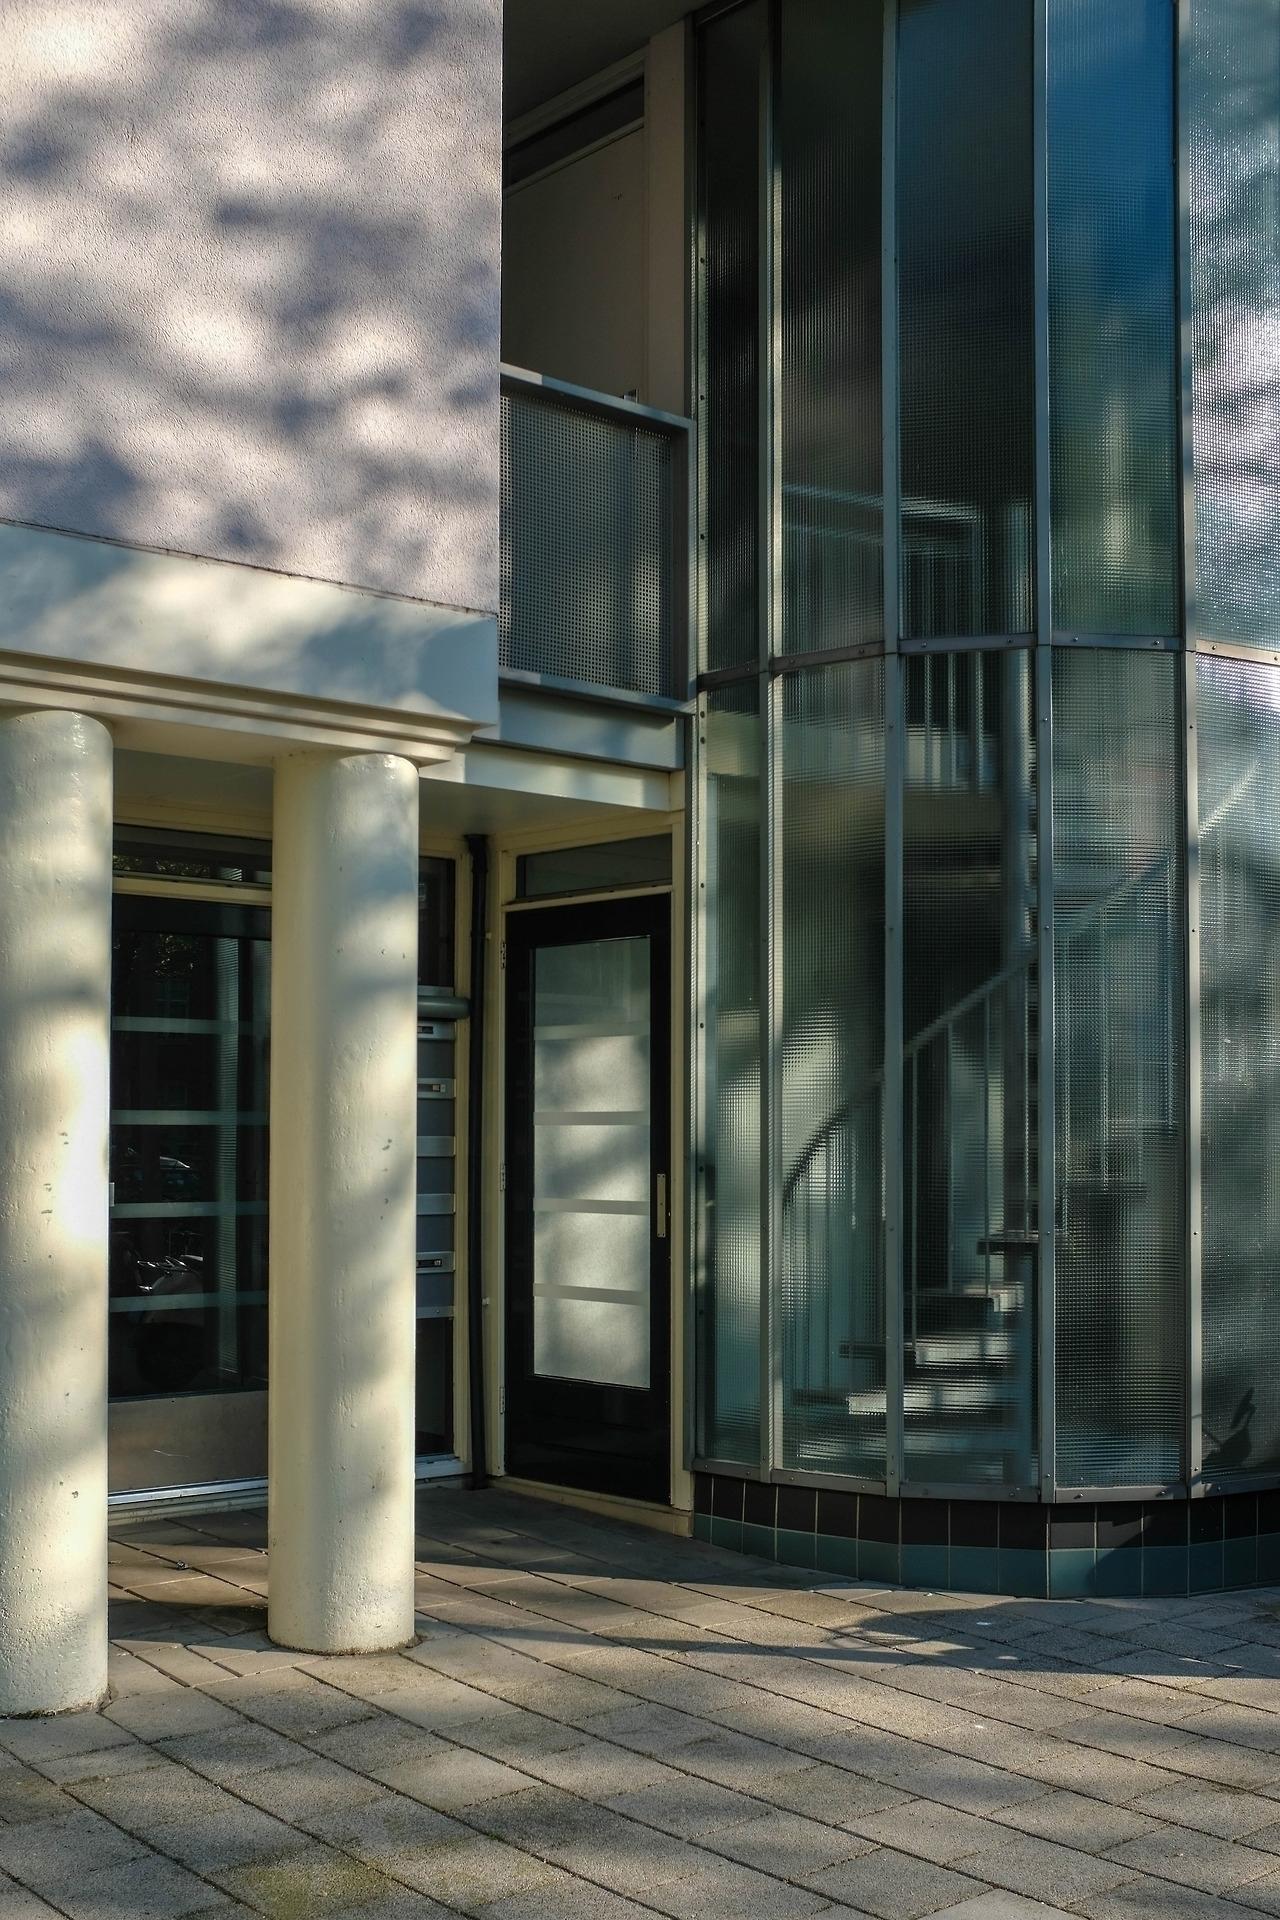 photography, fujifilm, architecture - makame | ello